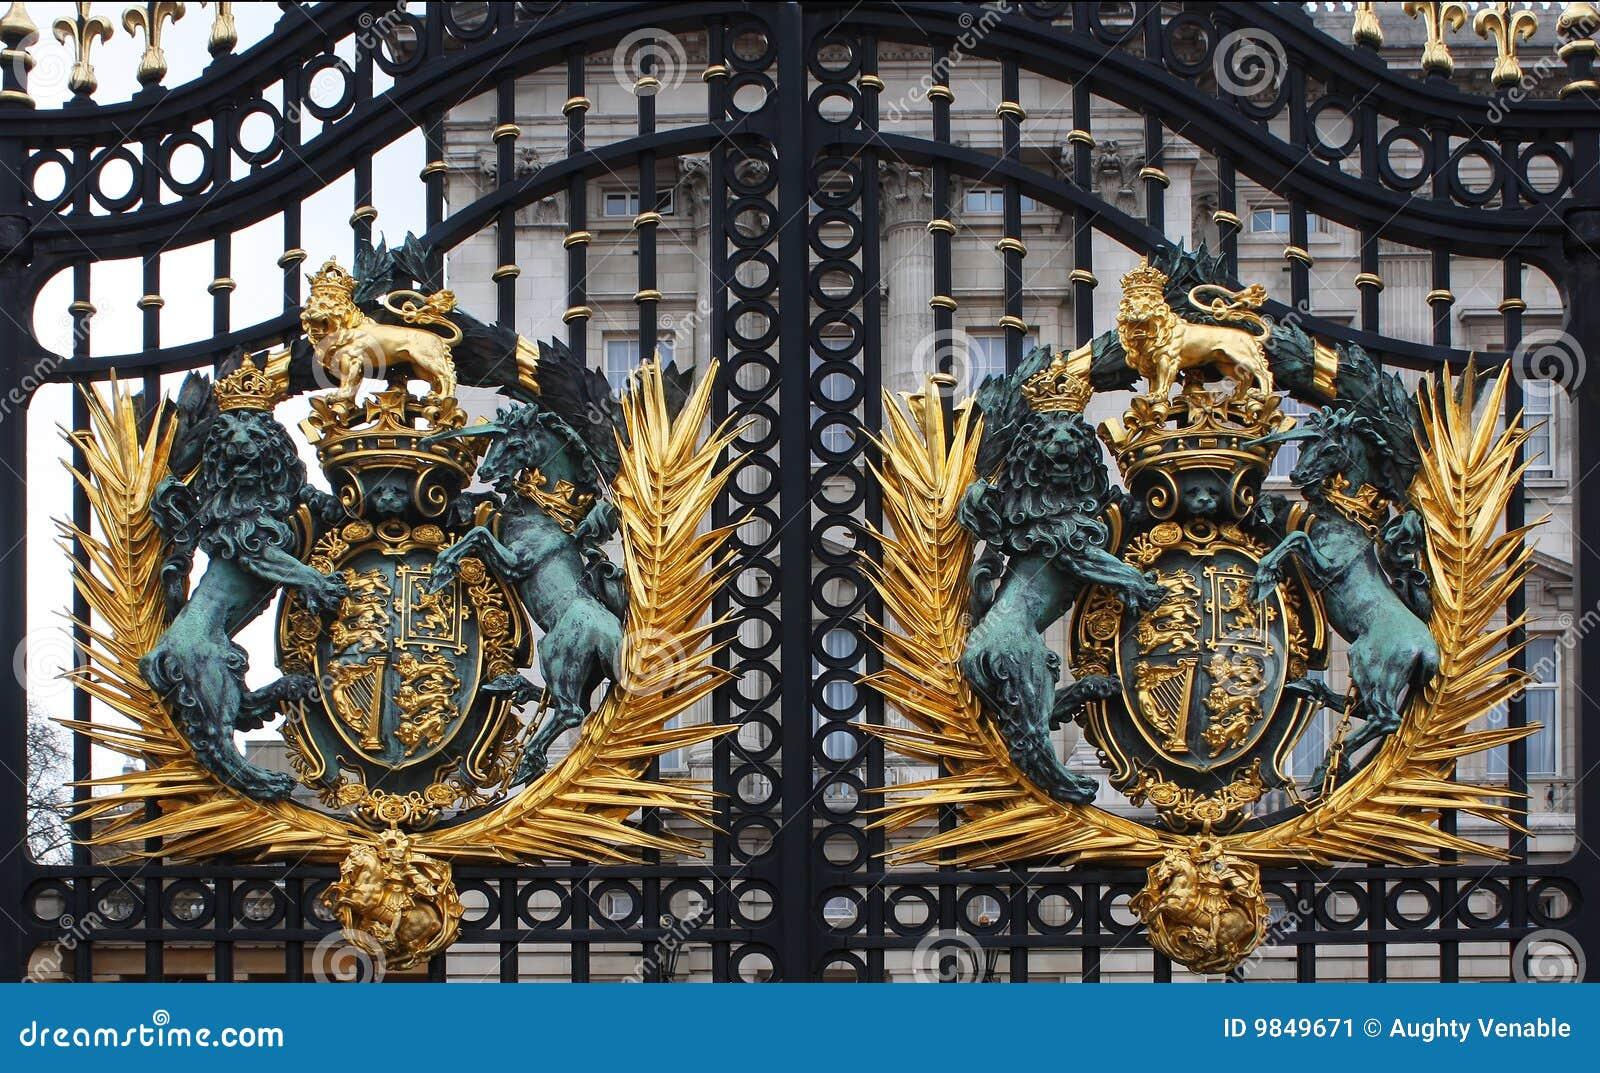 Buckingham gates slotten